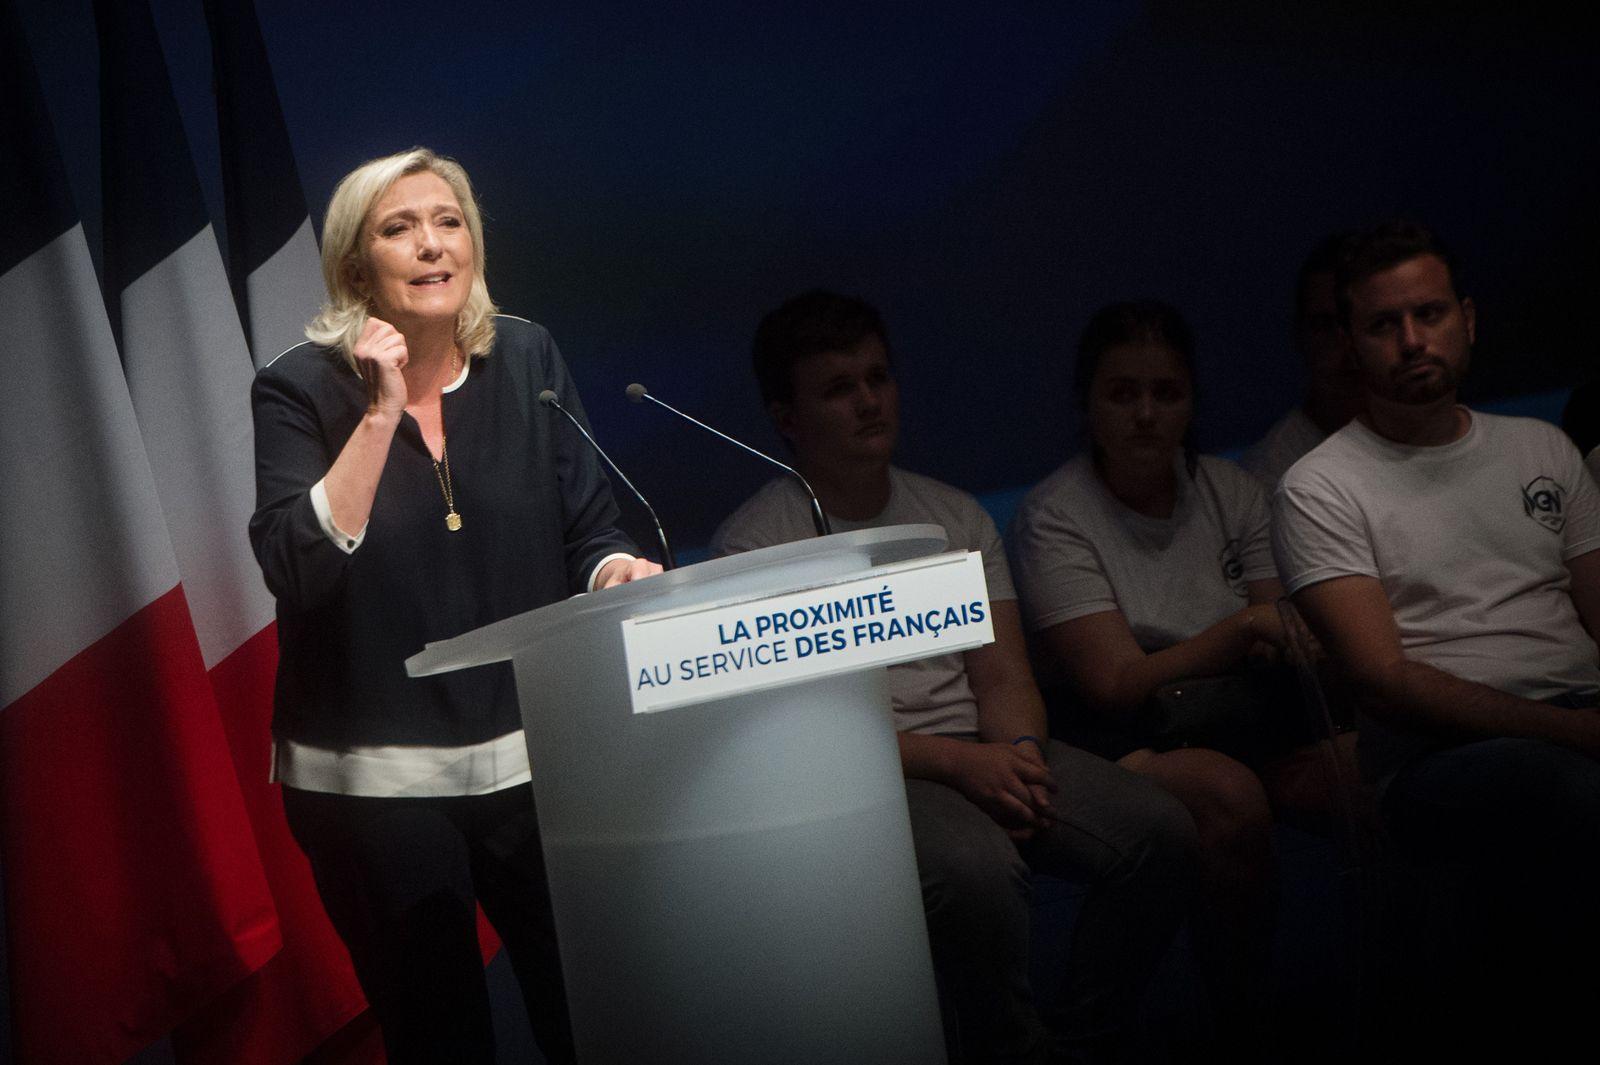 FRANCE-POLITICS-PARTIES-RN